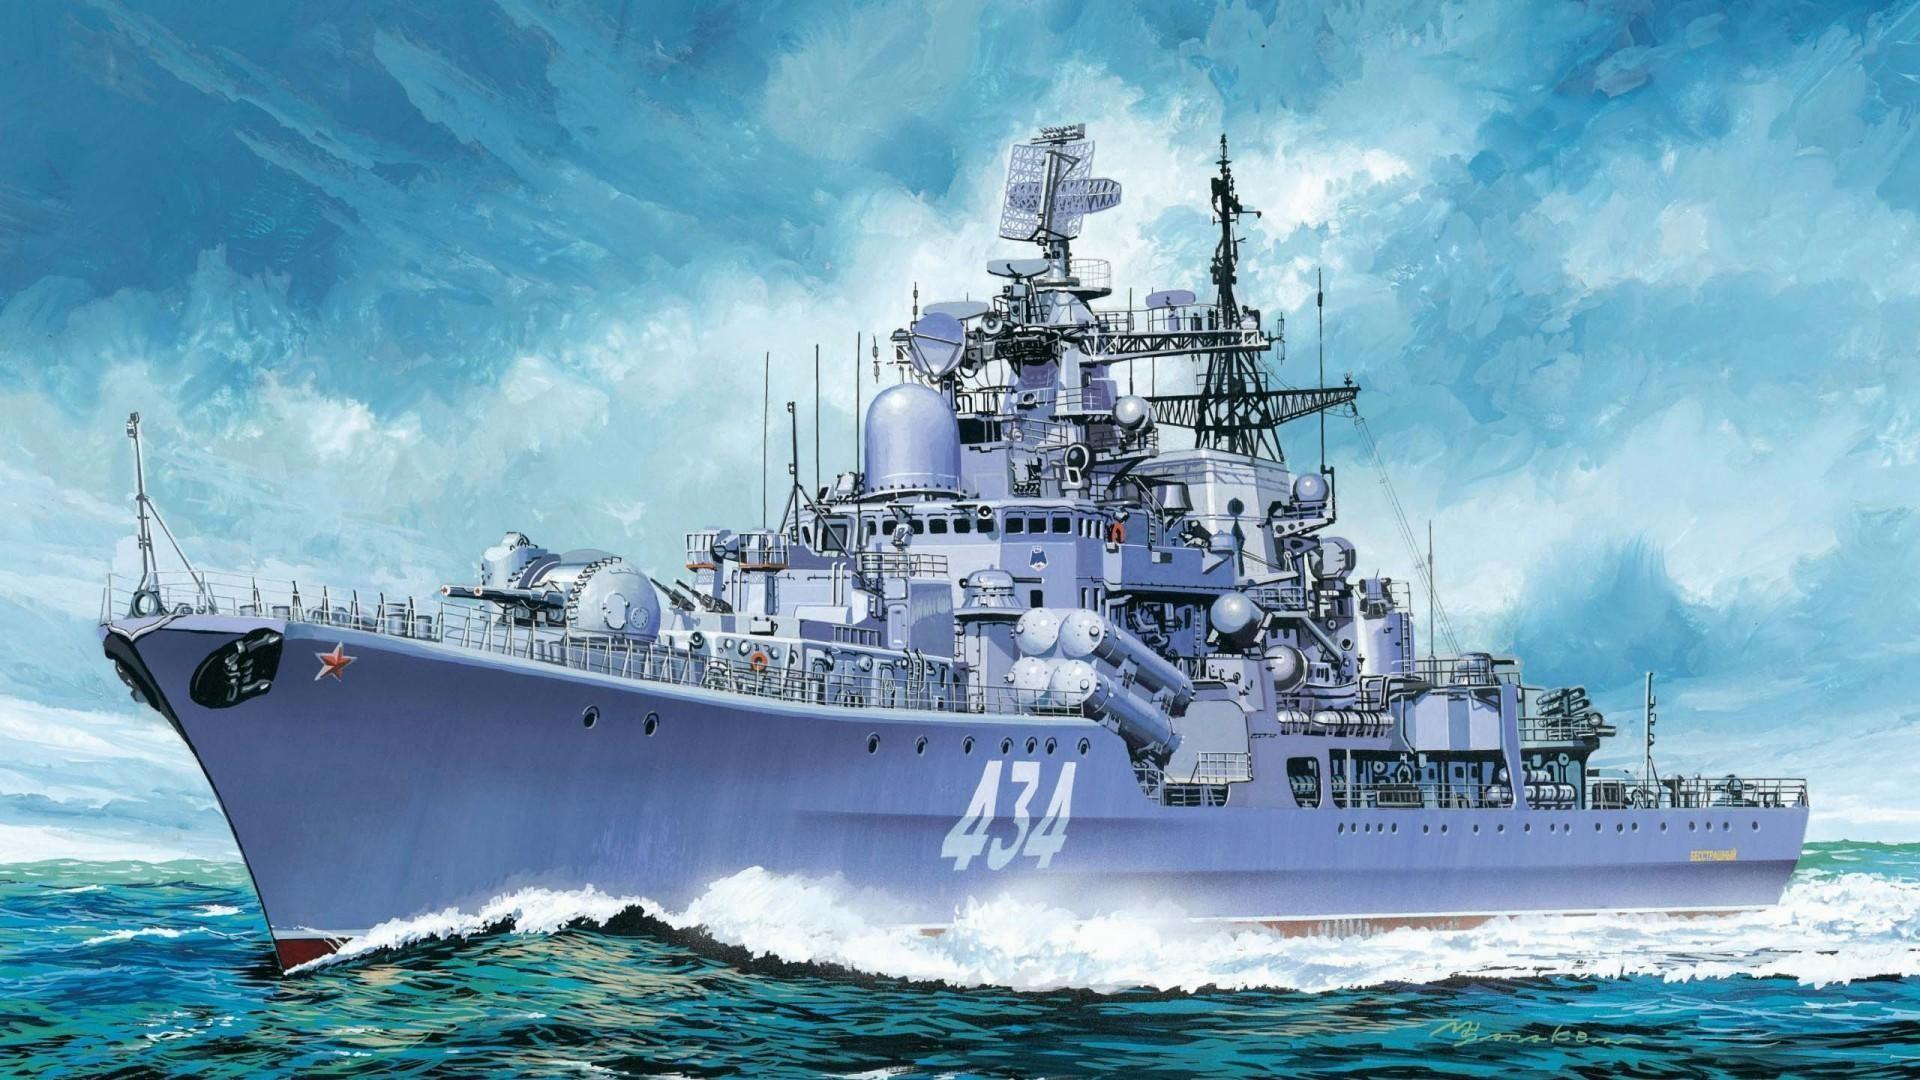 Navy Wallpaper and Screensavers 1024×768 Navy Wallpaper (40 Wallpapers)    Adorable Wallpapers